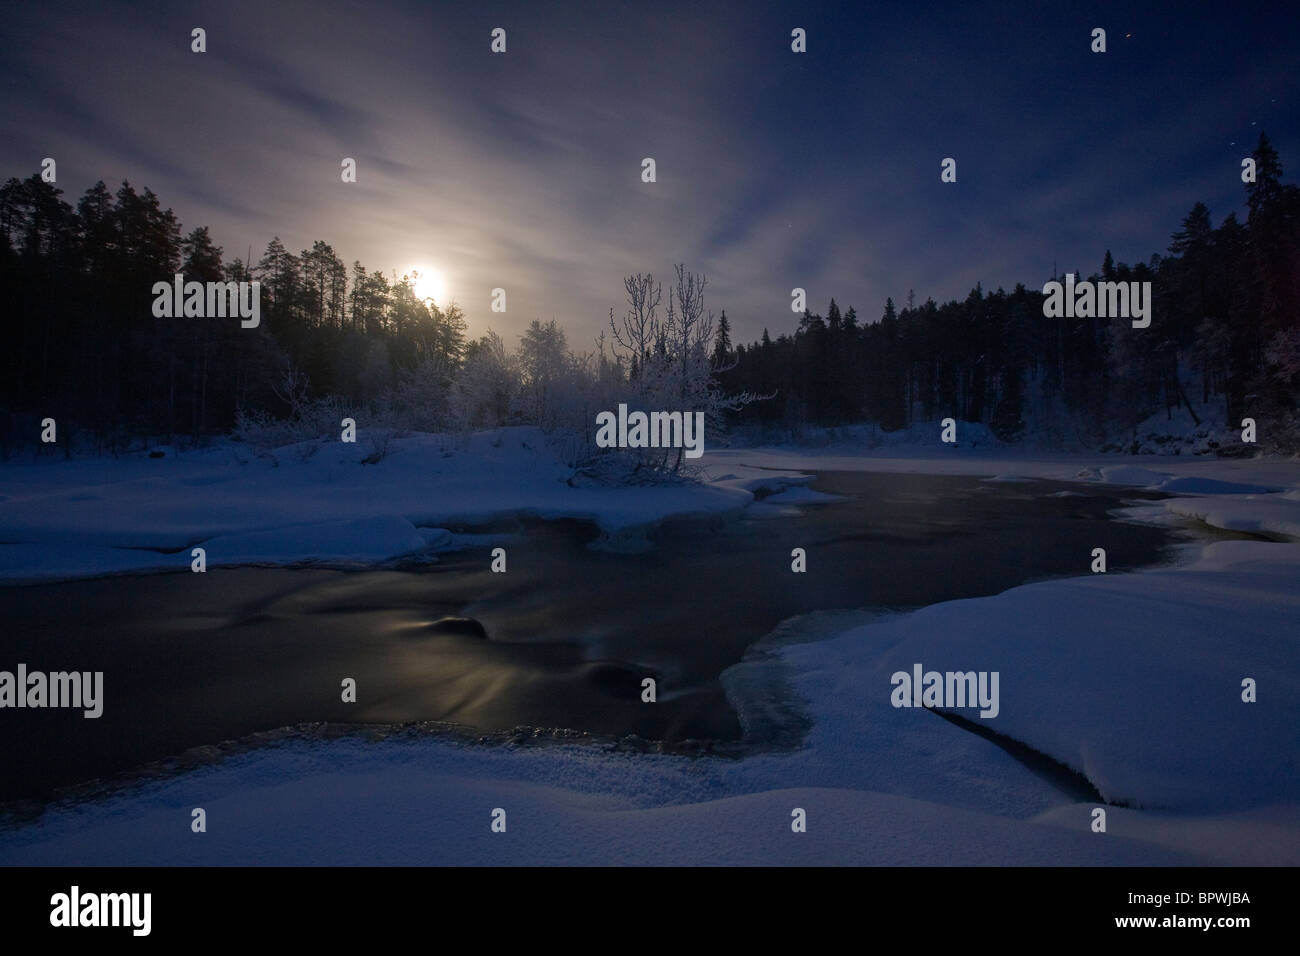 Moonrise on the Oulanka River in Oulanka National Park, Finland. - Stock Image